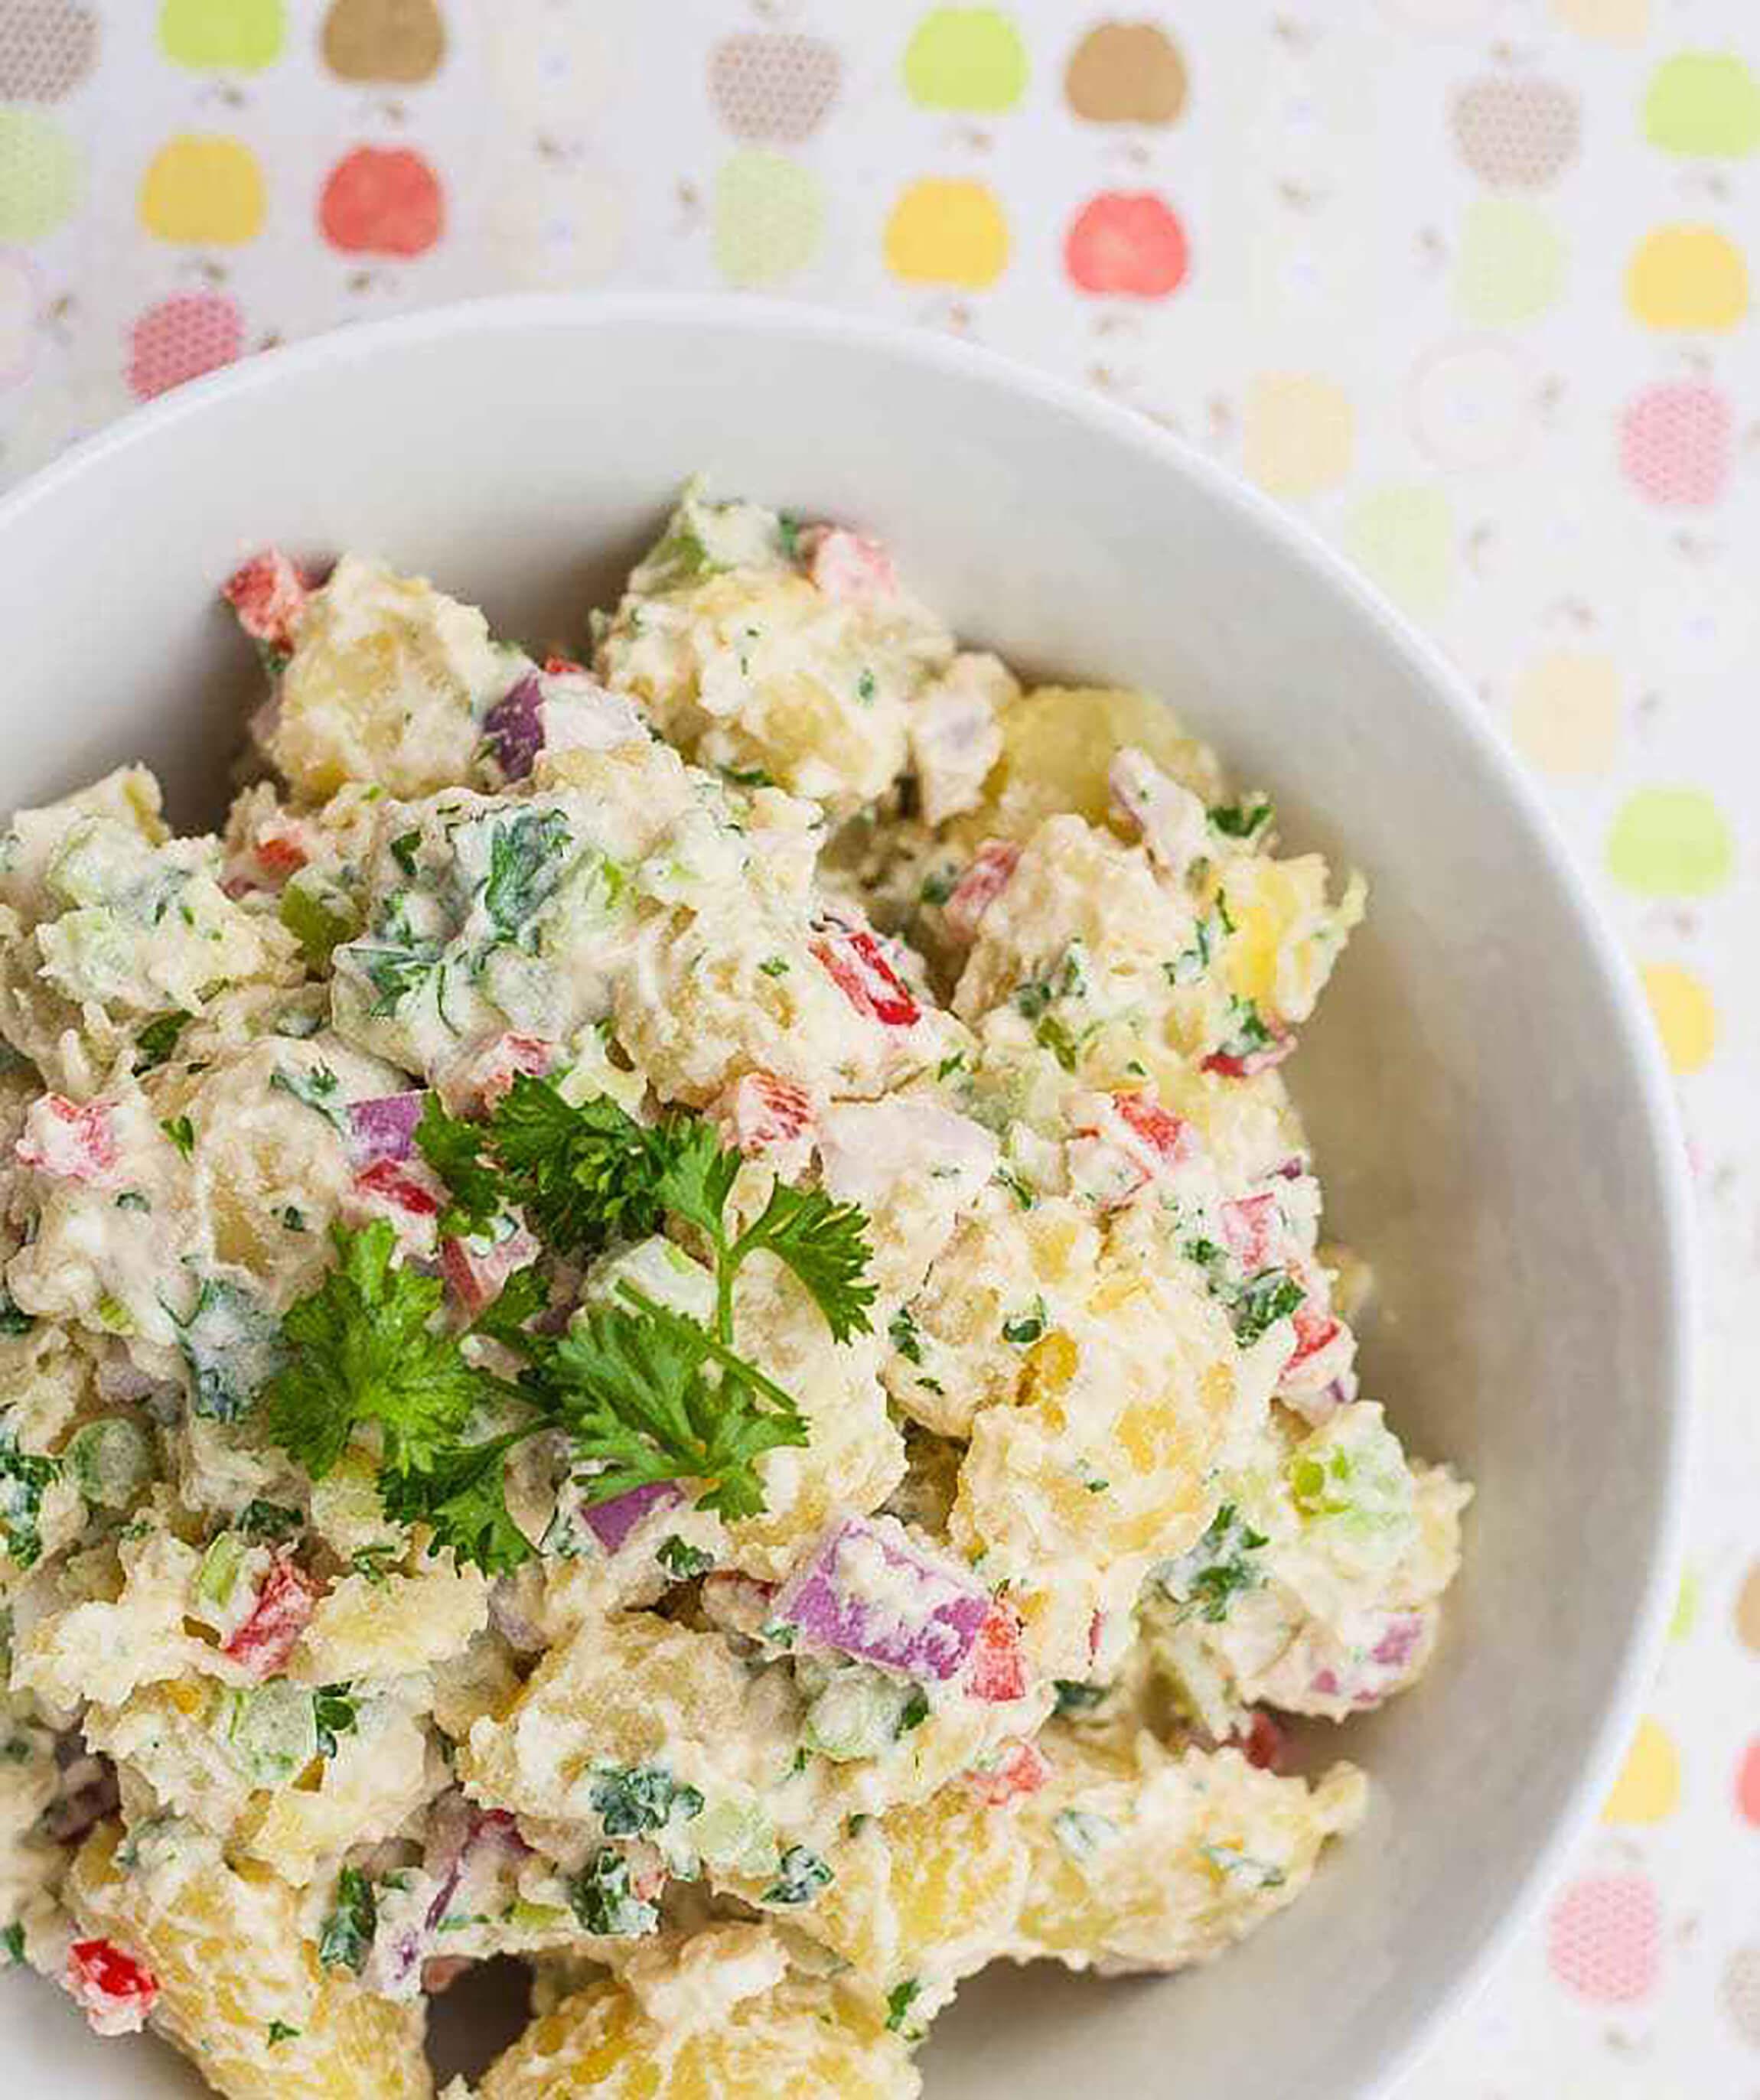 Healthy potato salad recipe